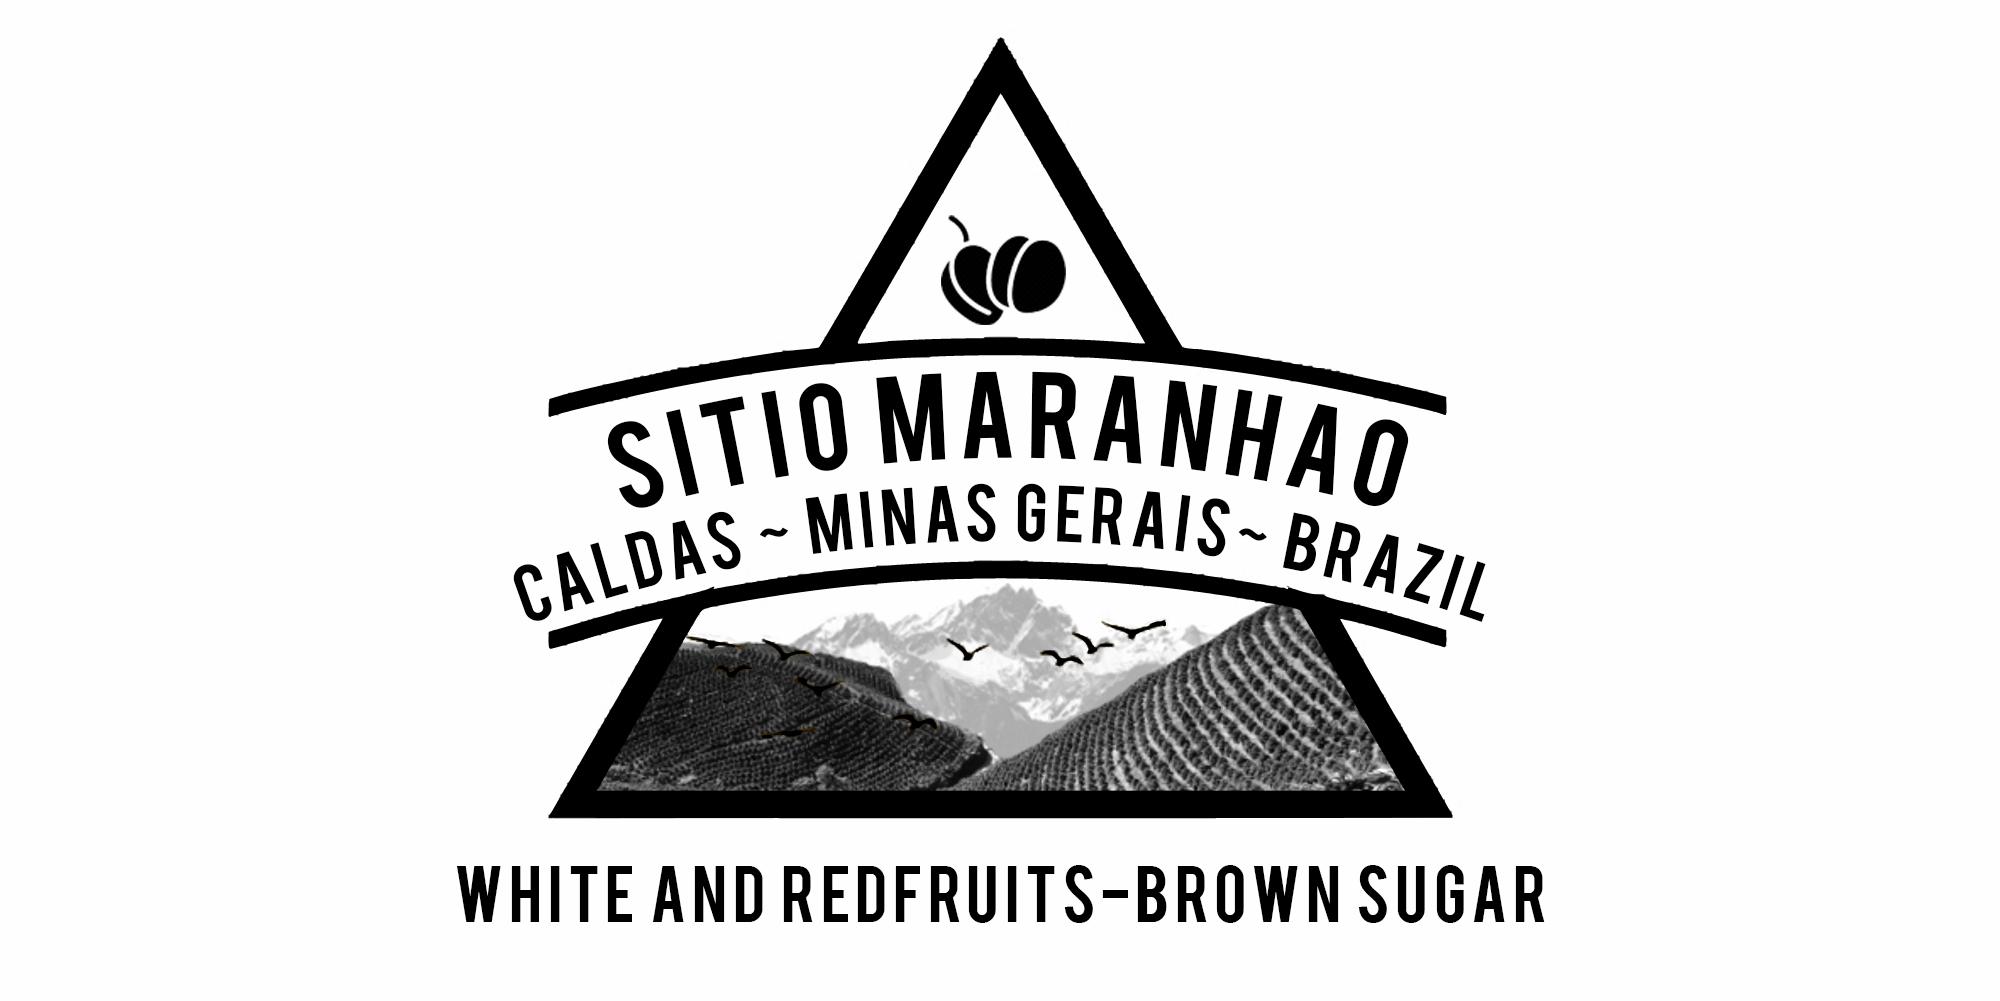 BRAZIL SITIO MARANHAO